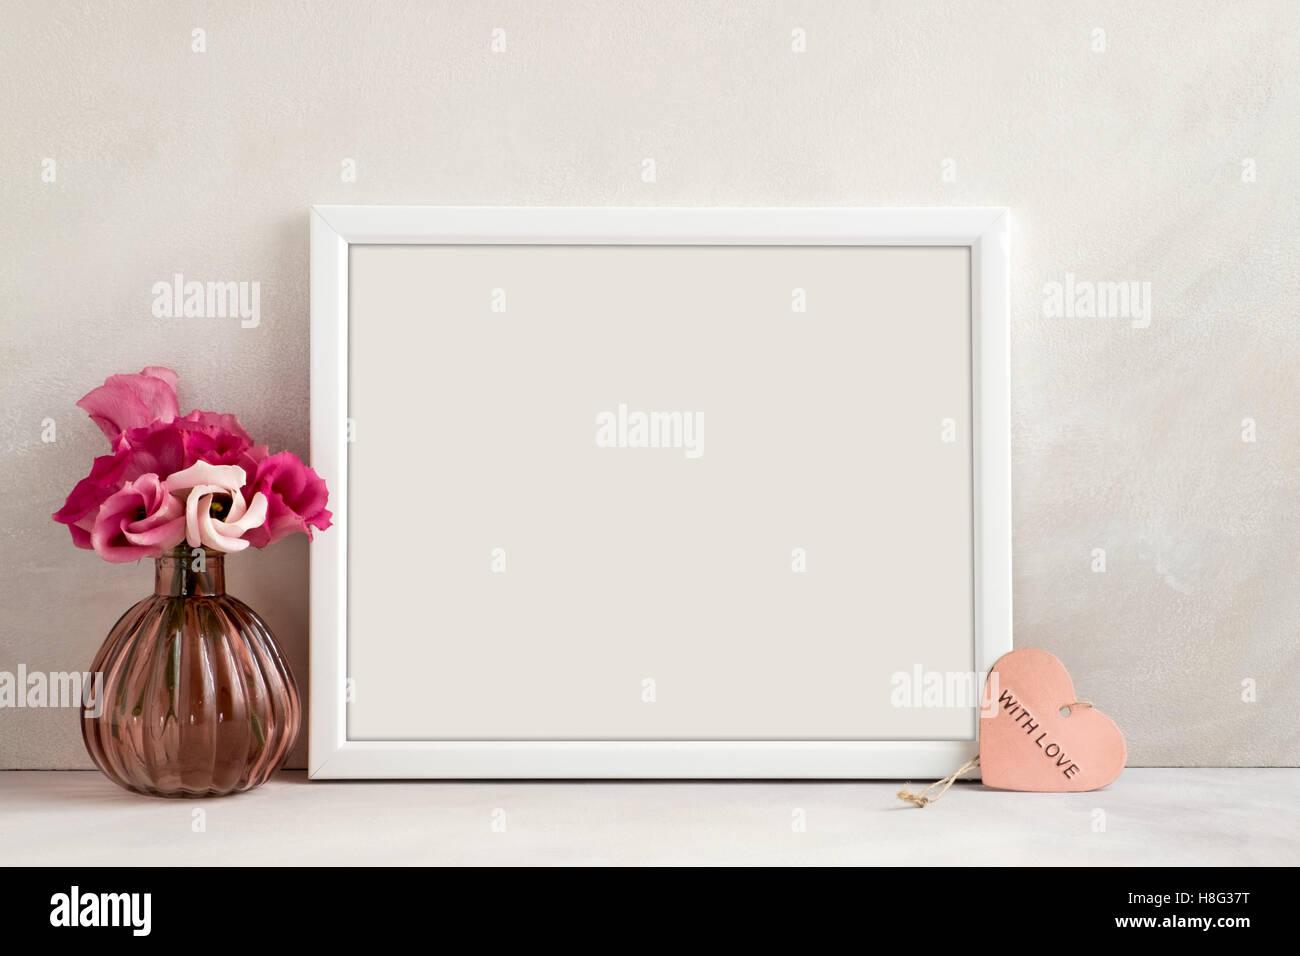 White landscape frame mockup, vase of flowers & pink heart beside the frame, overlay quote, promotion, headline, Stock Photo